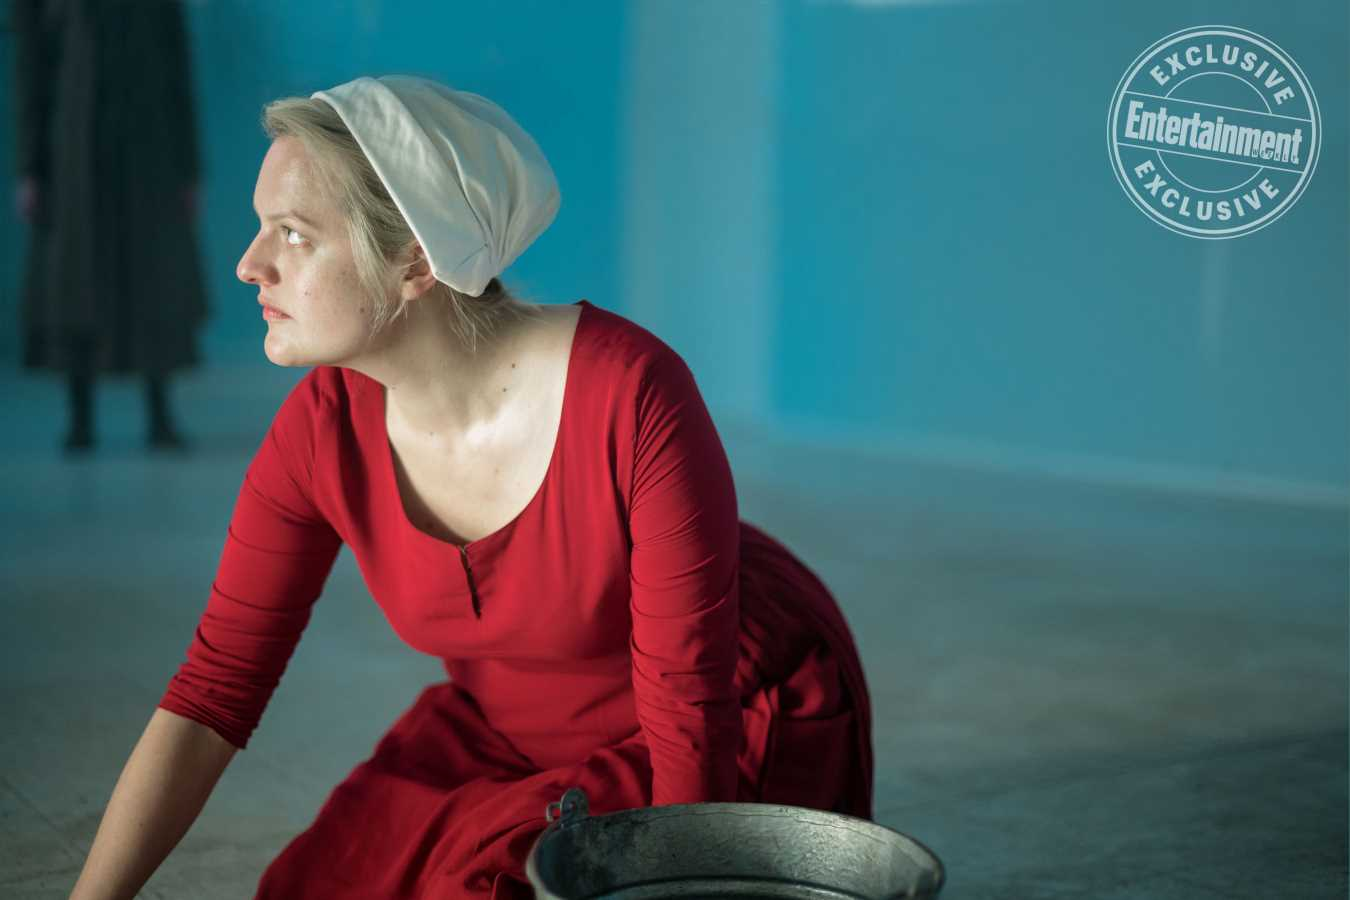 Hulu's The Handmaid's Tale season 3 preview: Elisabeth Moss interview